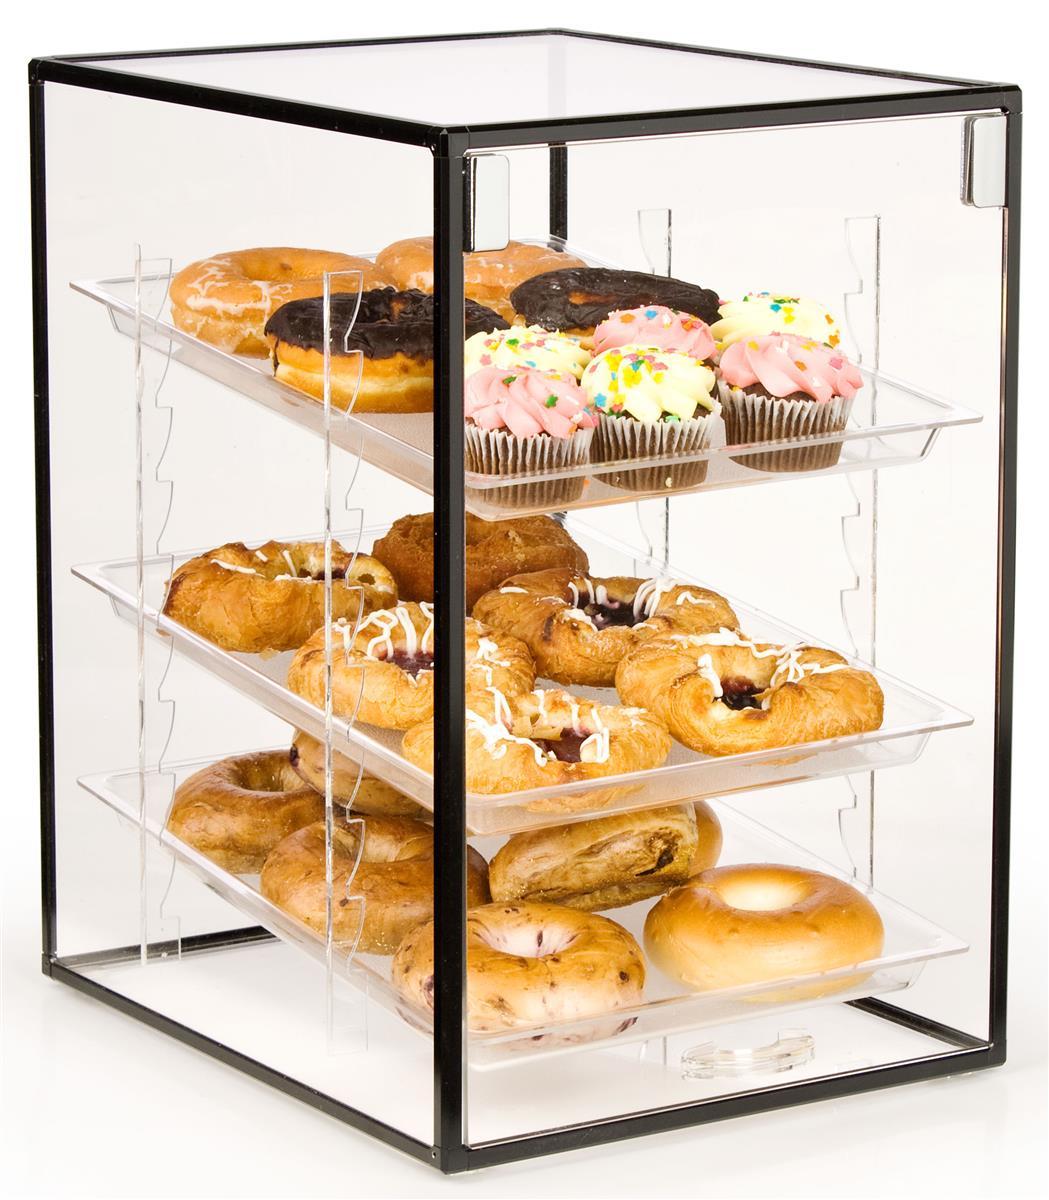 Countertop Bakery Display Cases : Countertop Bakery Display Case Hinged Door Display, Removable Trays